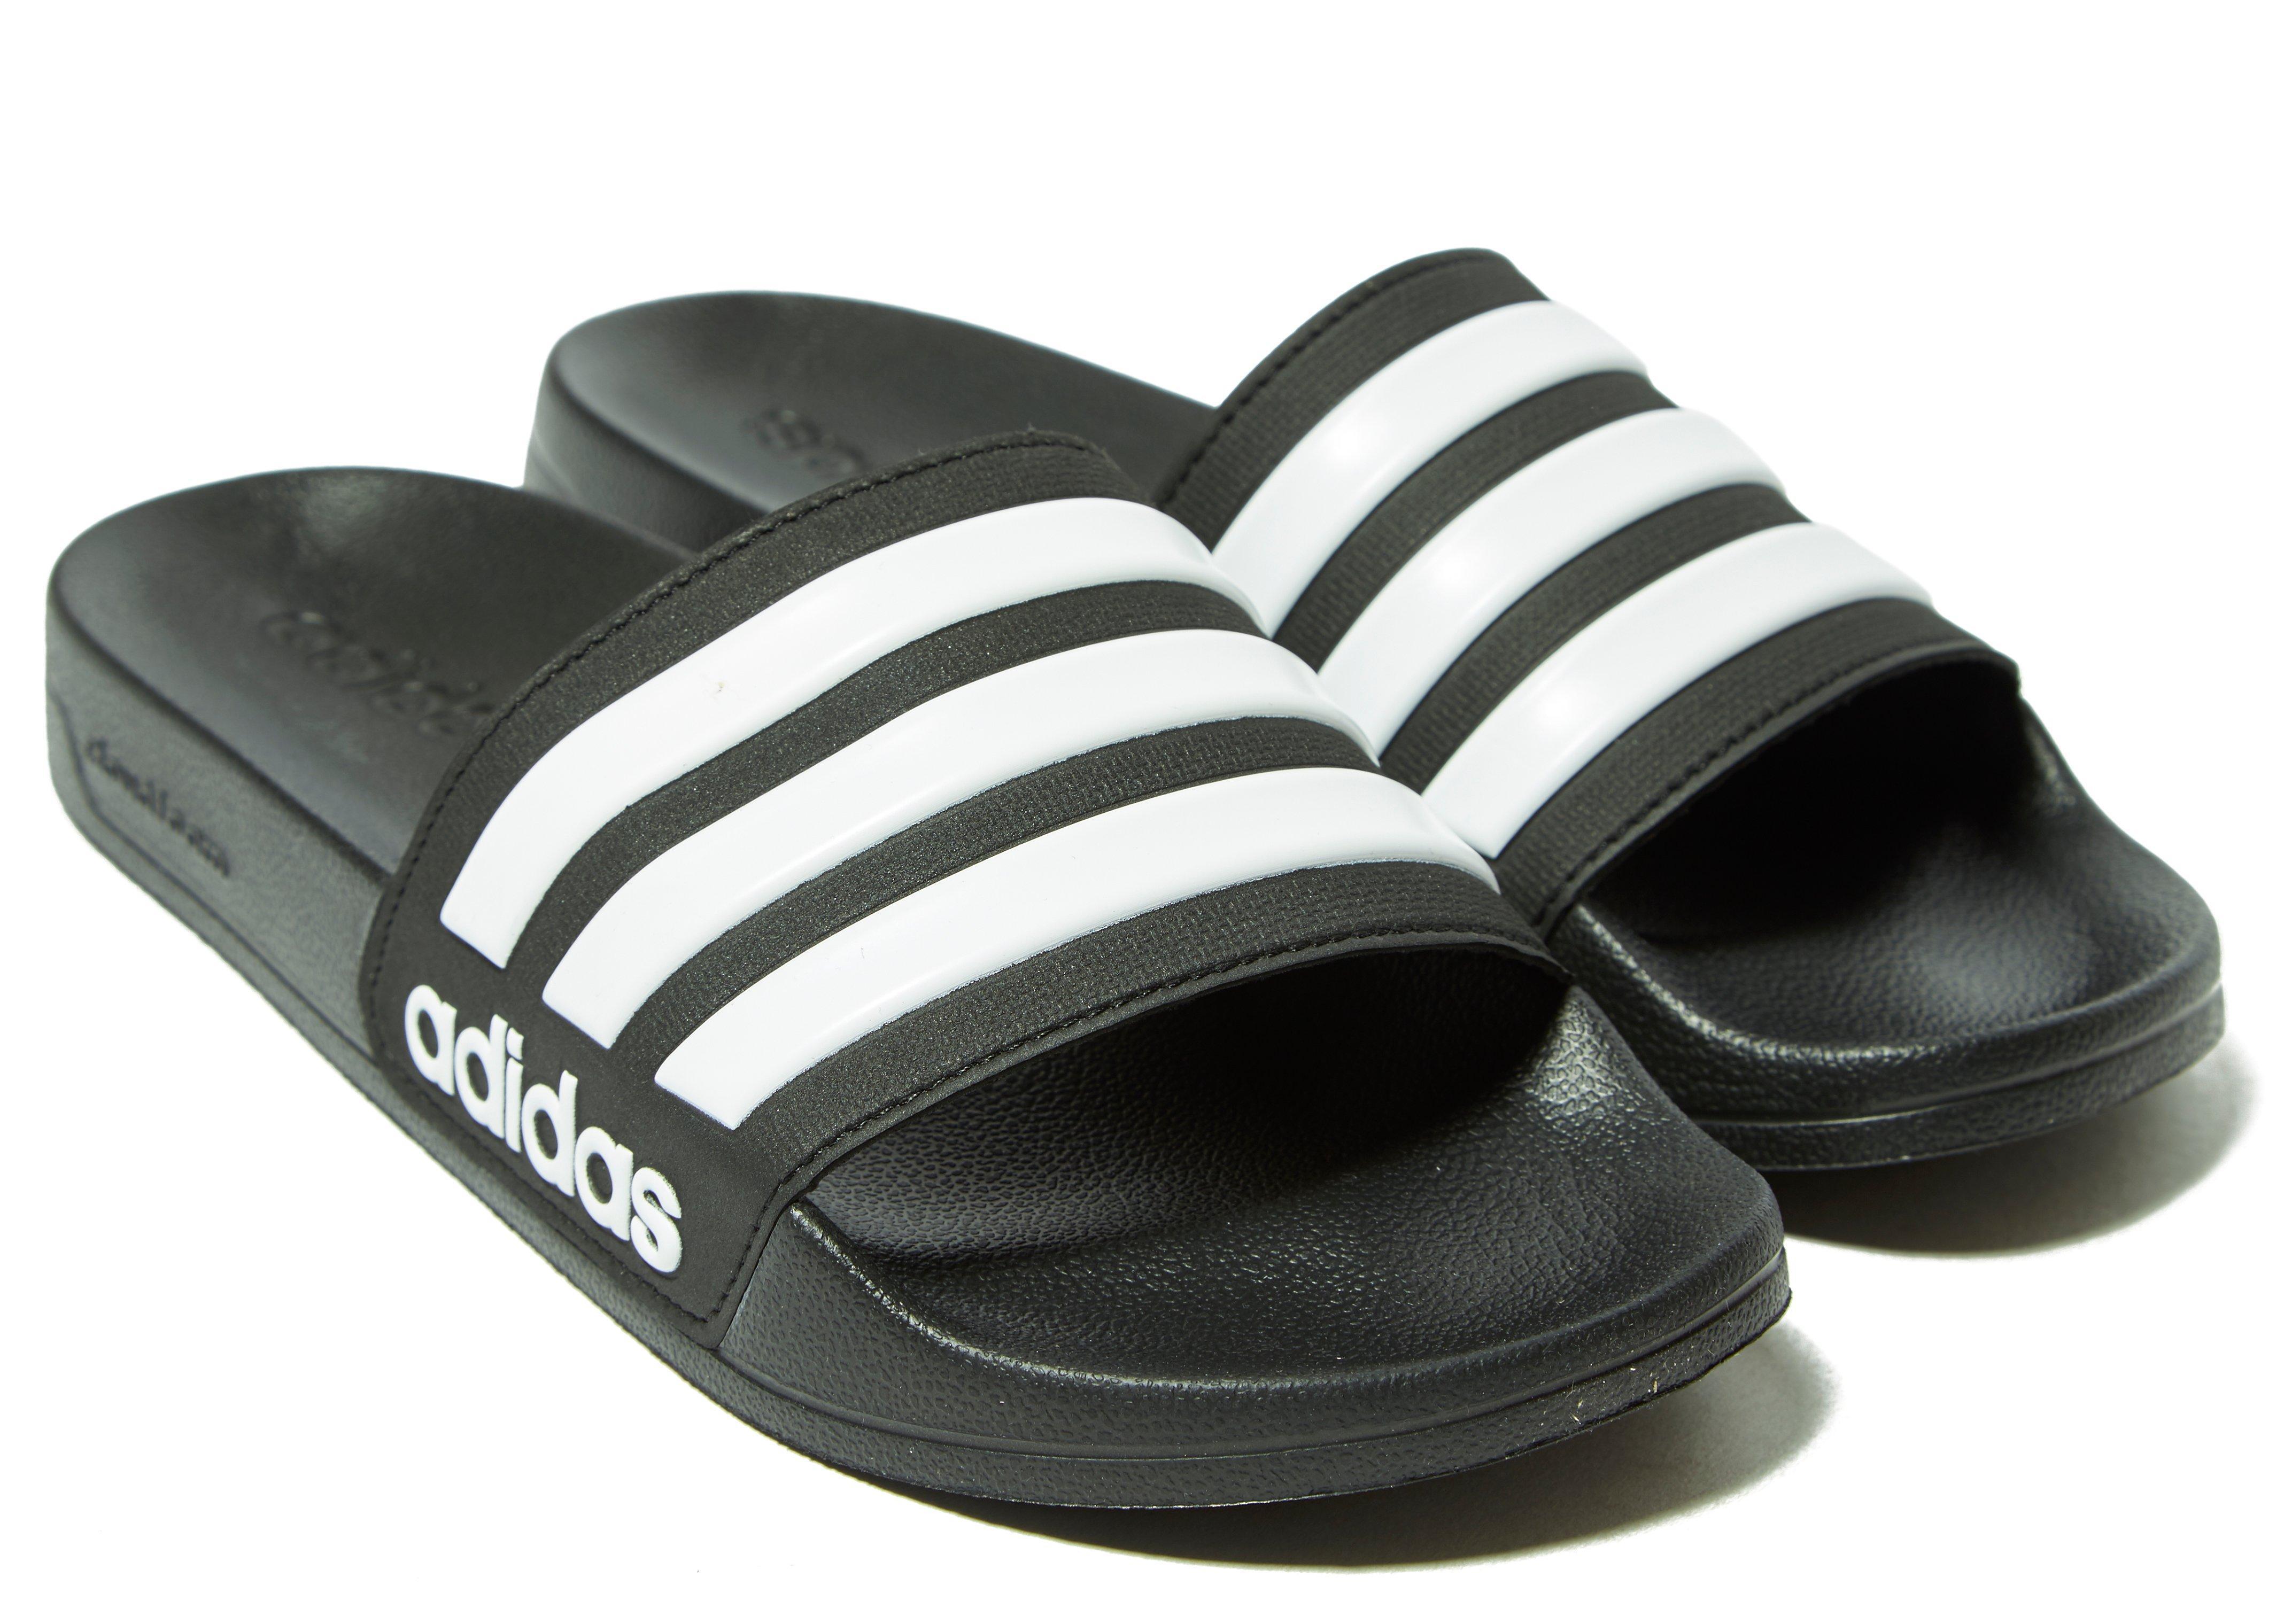 Lyst - Adidas Cloudfoam Adilette Slides in Black 7aac738f2